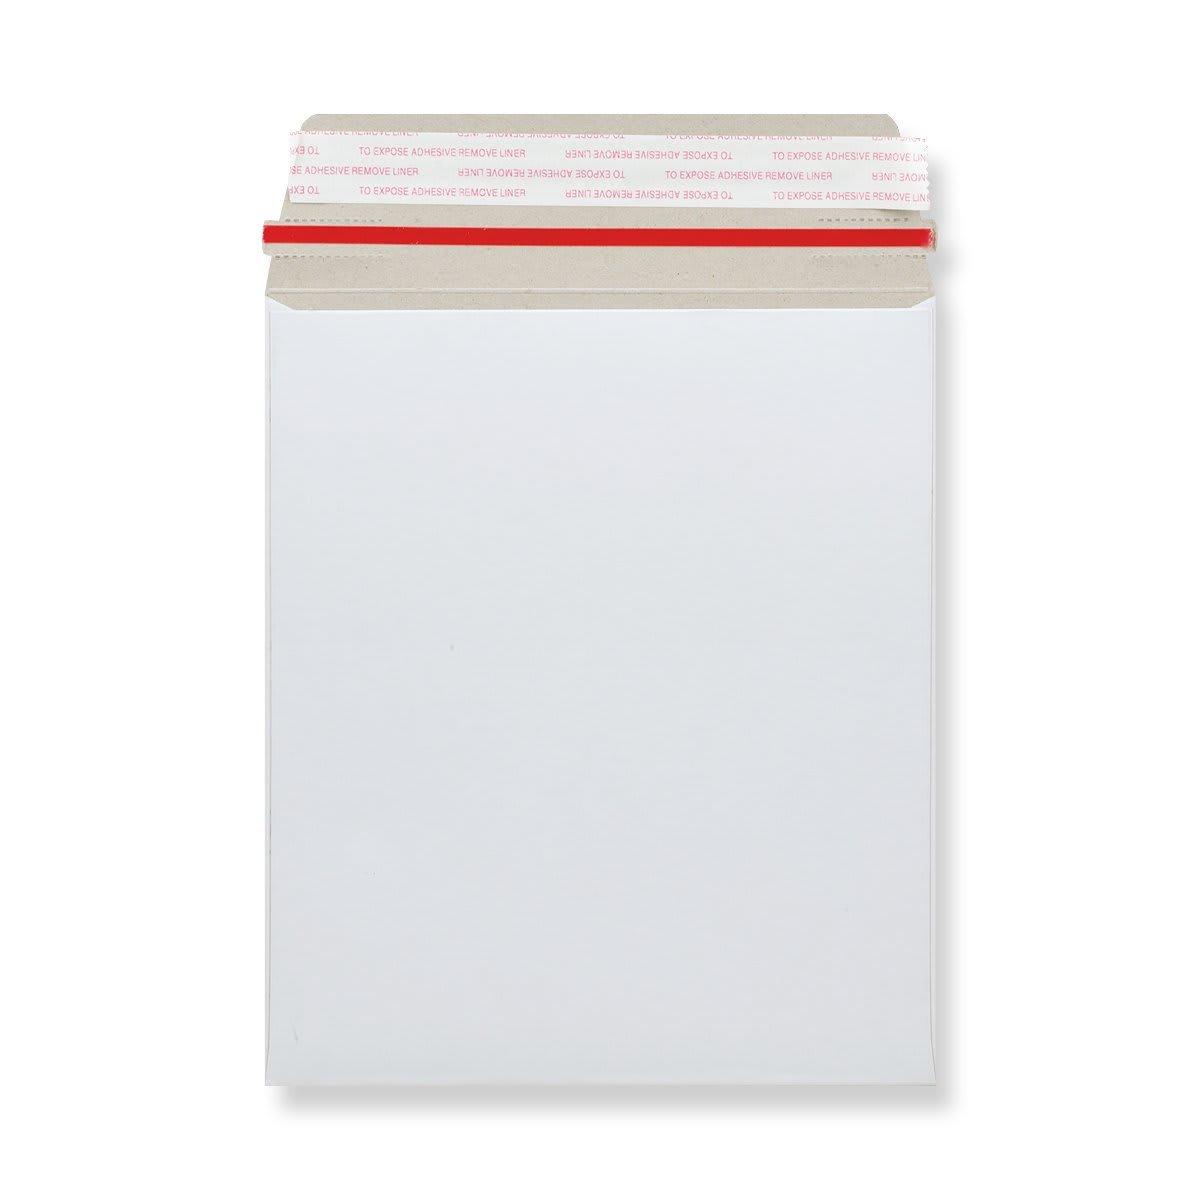 273 x 222mm WHITE ALL BOARD ENVELOPES